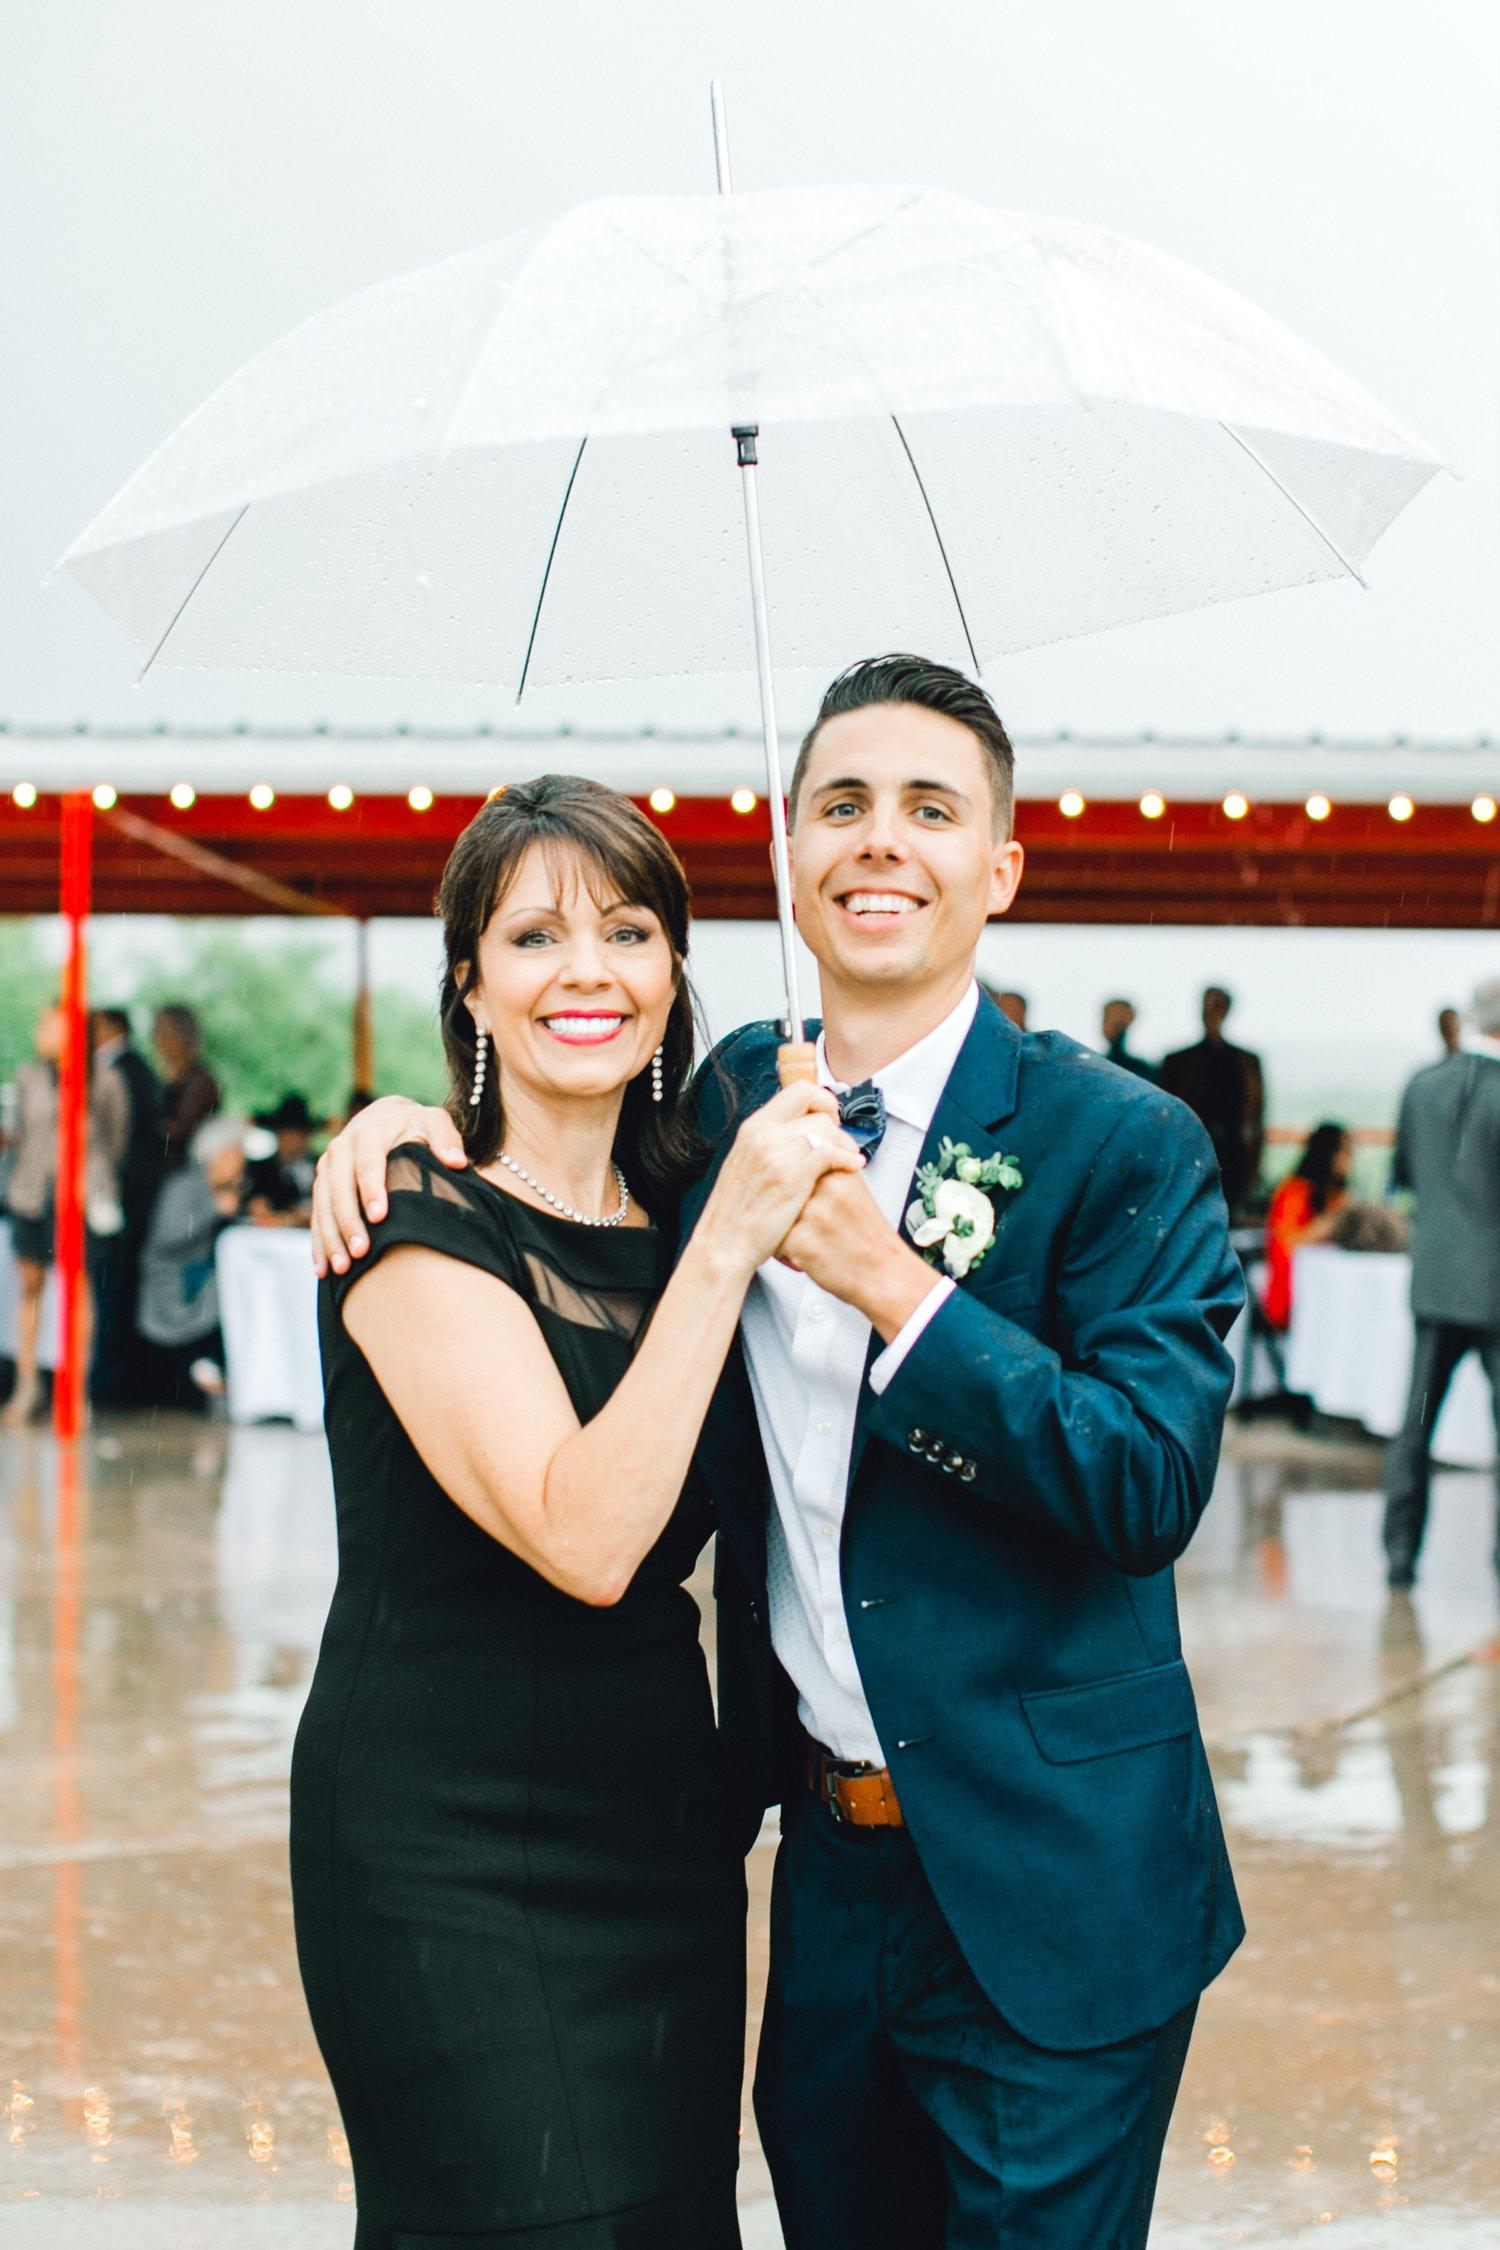 Ashley_John_English_Elegant_Texas_Wedding_Outdoors_Ranch_Caprock_Winery_ALLEEJ_0179.jpg